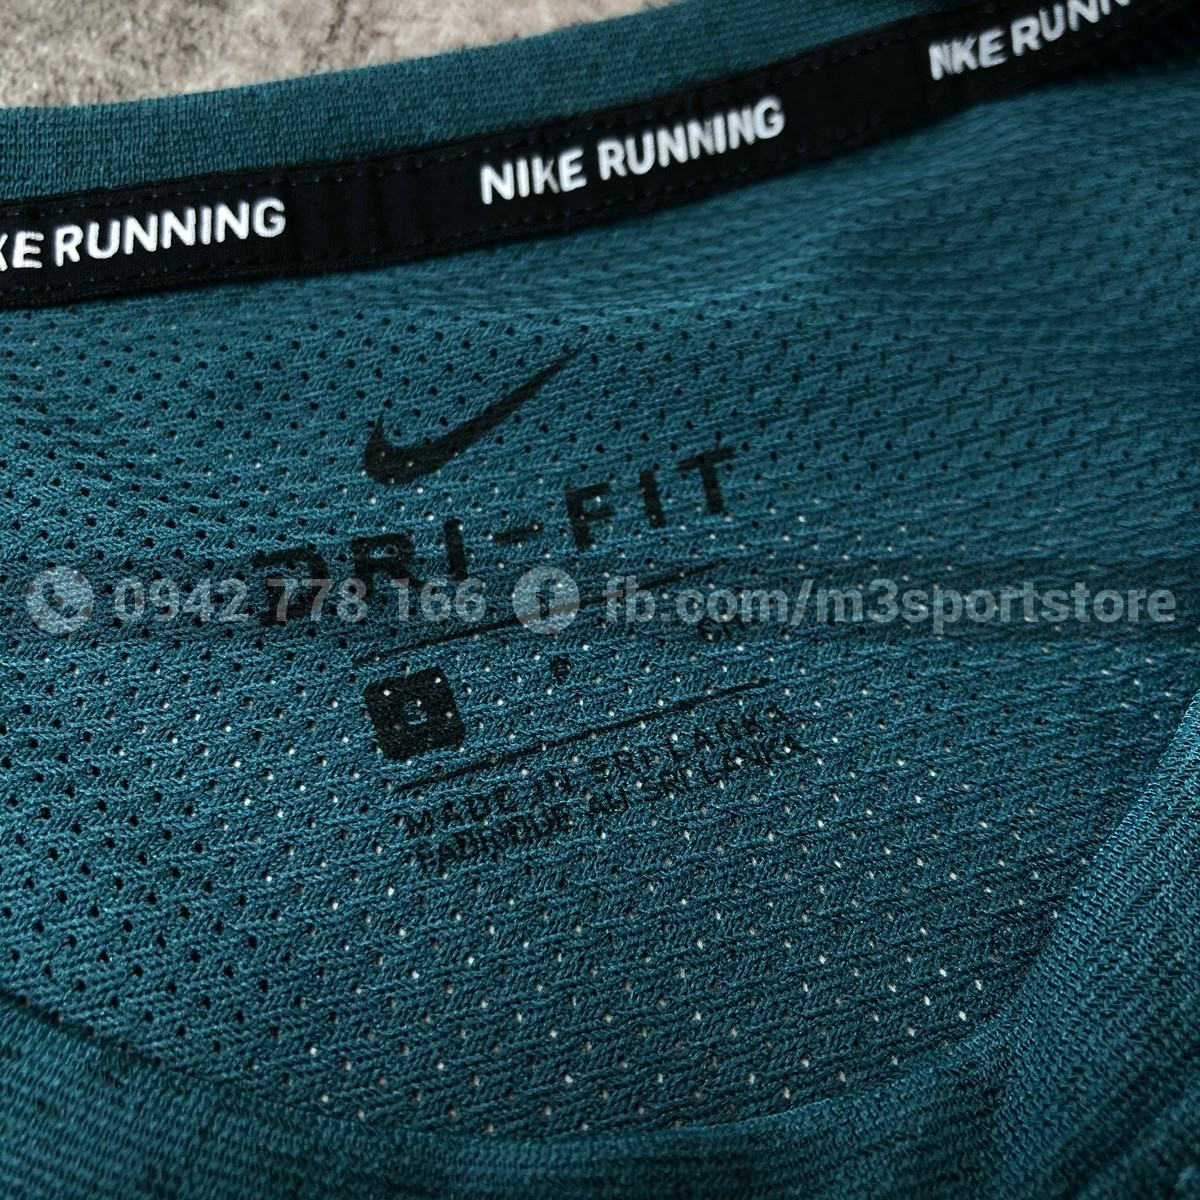 Áo thể thao nam Nike Dri-FIT Miler Wild Run DA0217-393